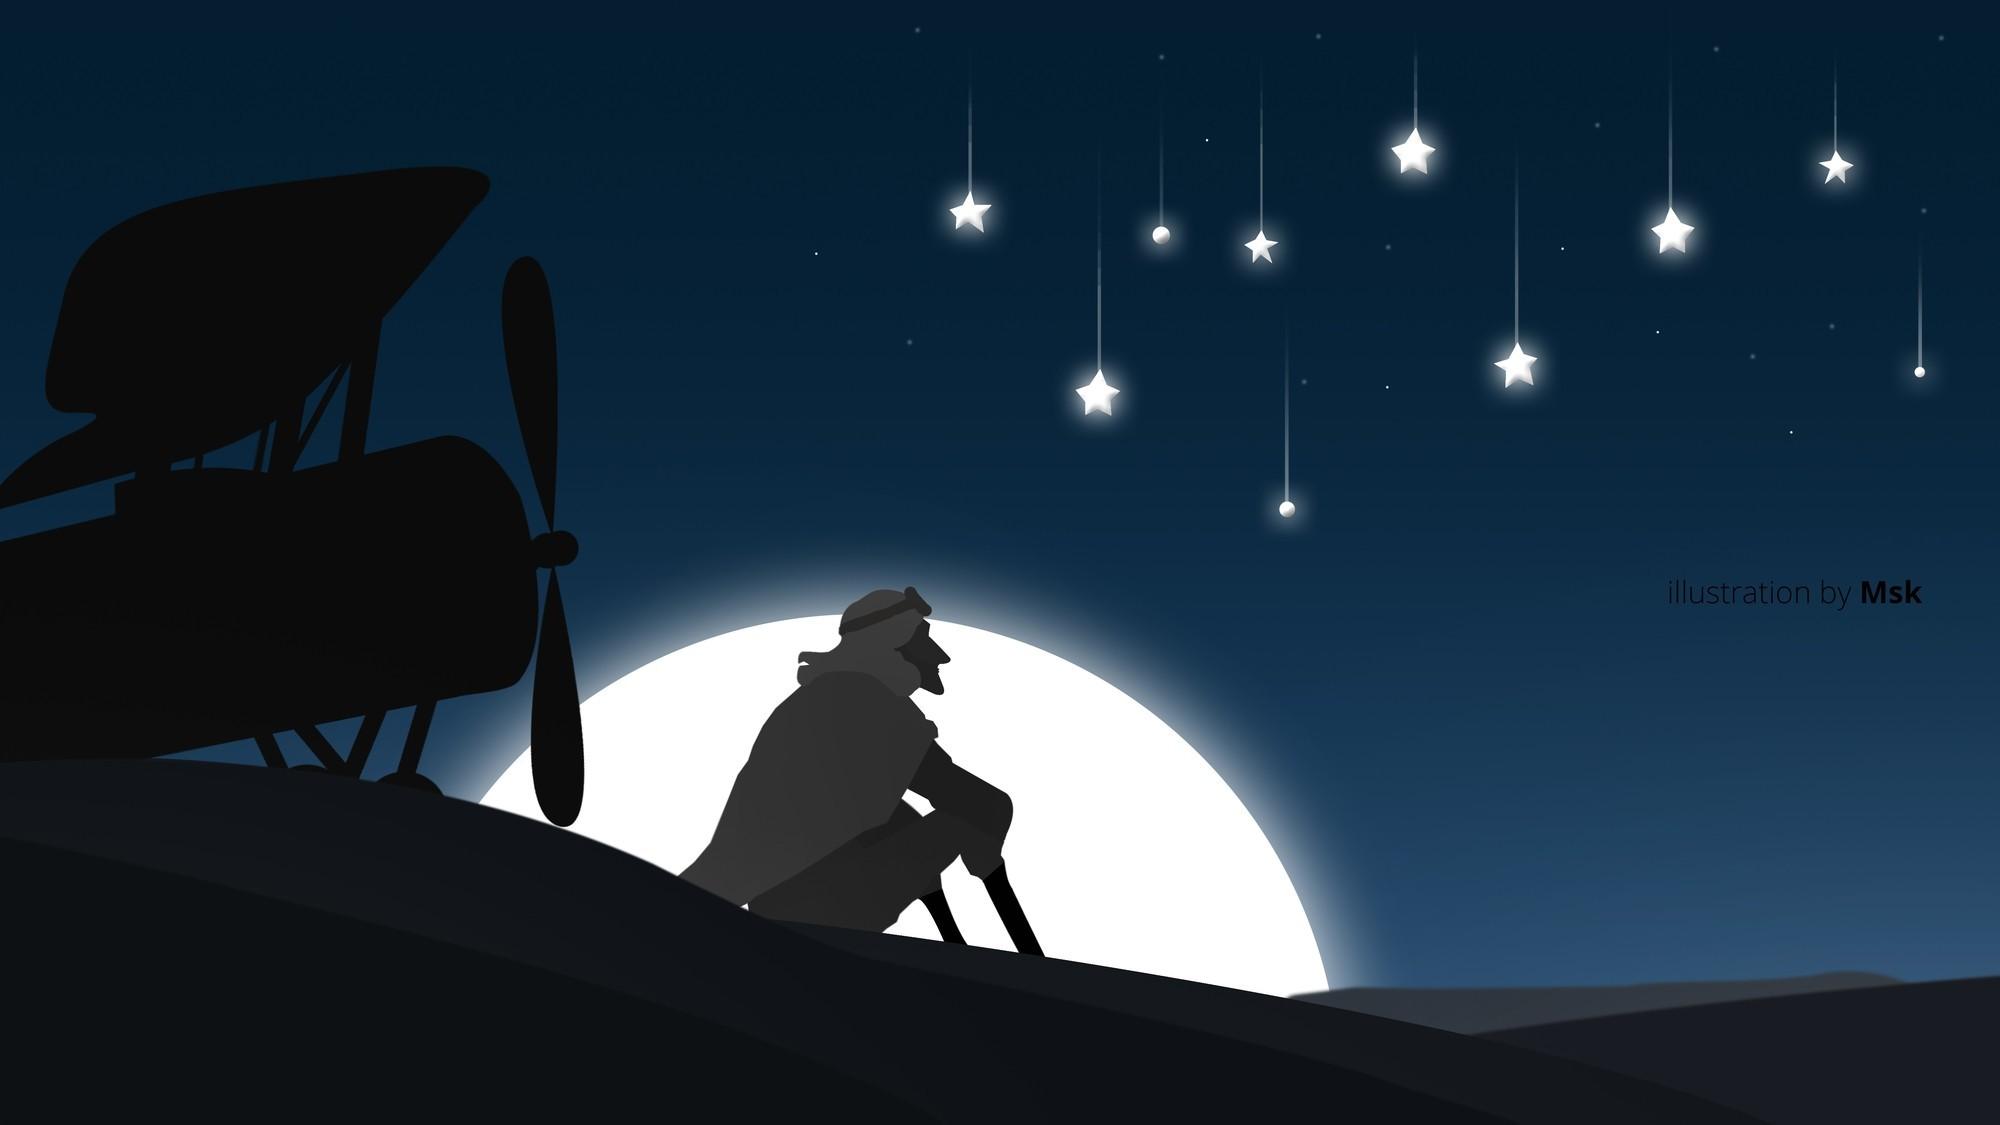 General illustration Adobe Illustrator Photoshop movies the  little prince landscape moonlight stars airplane Sahara